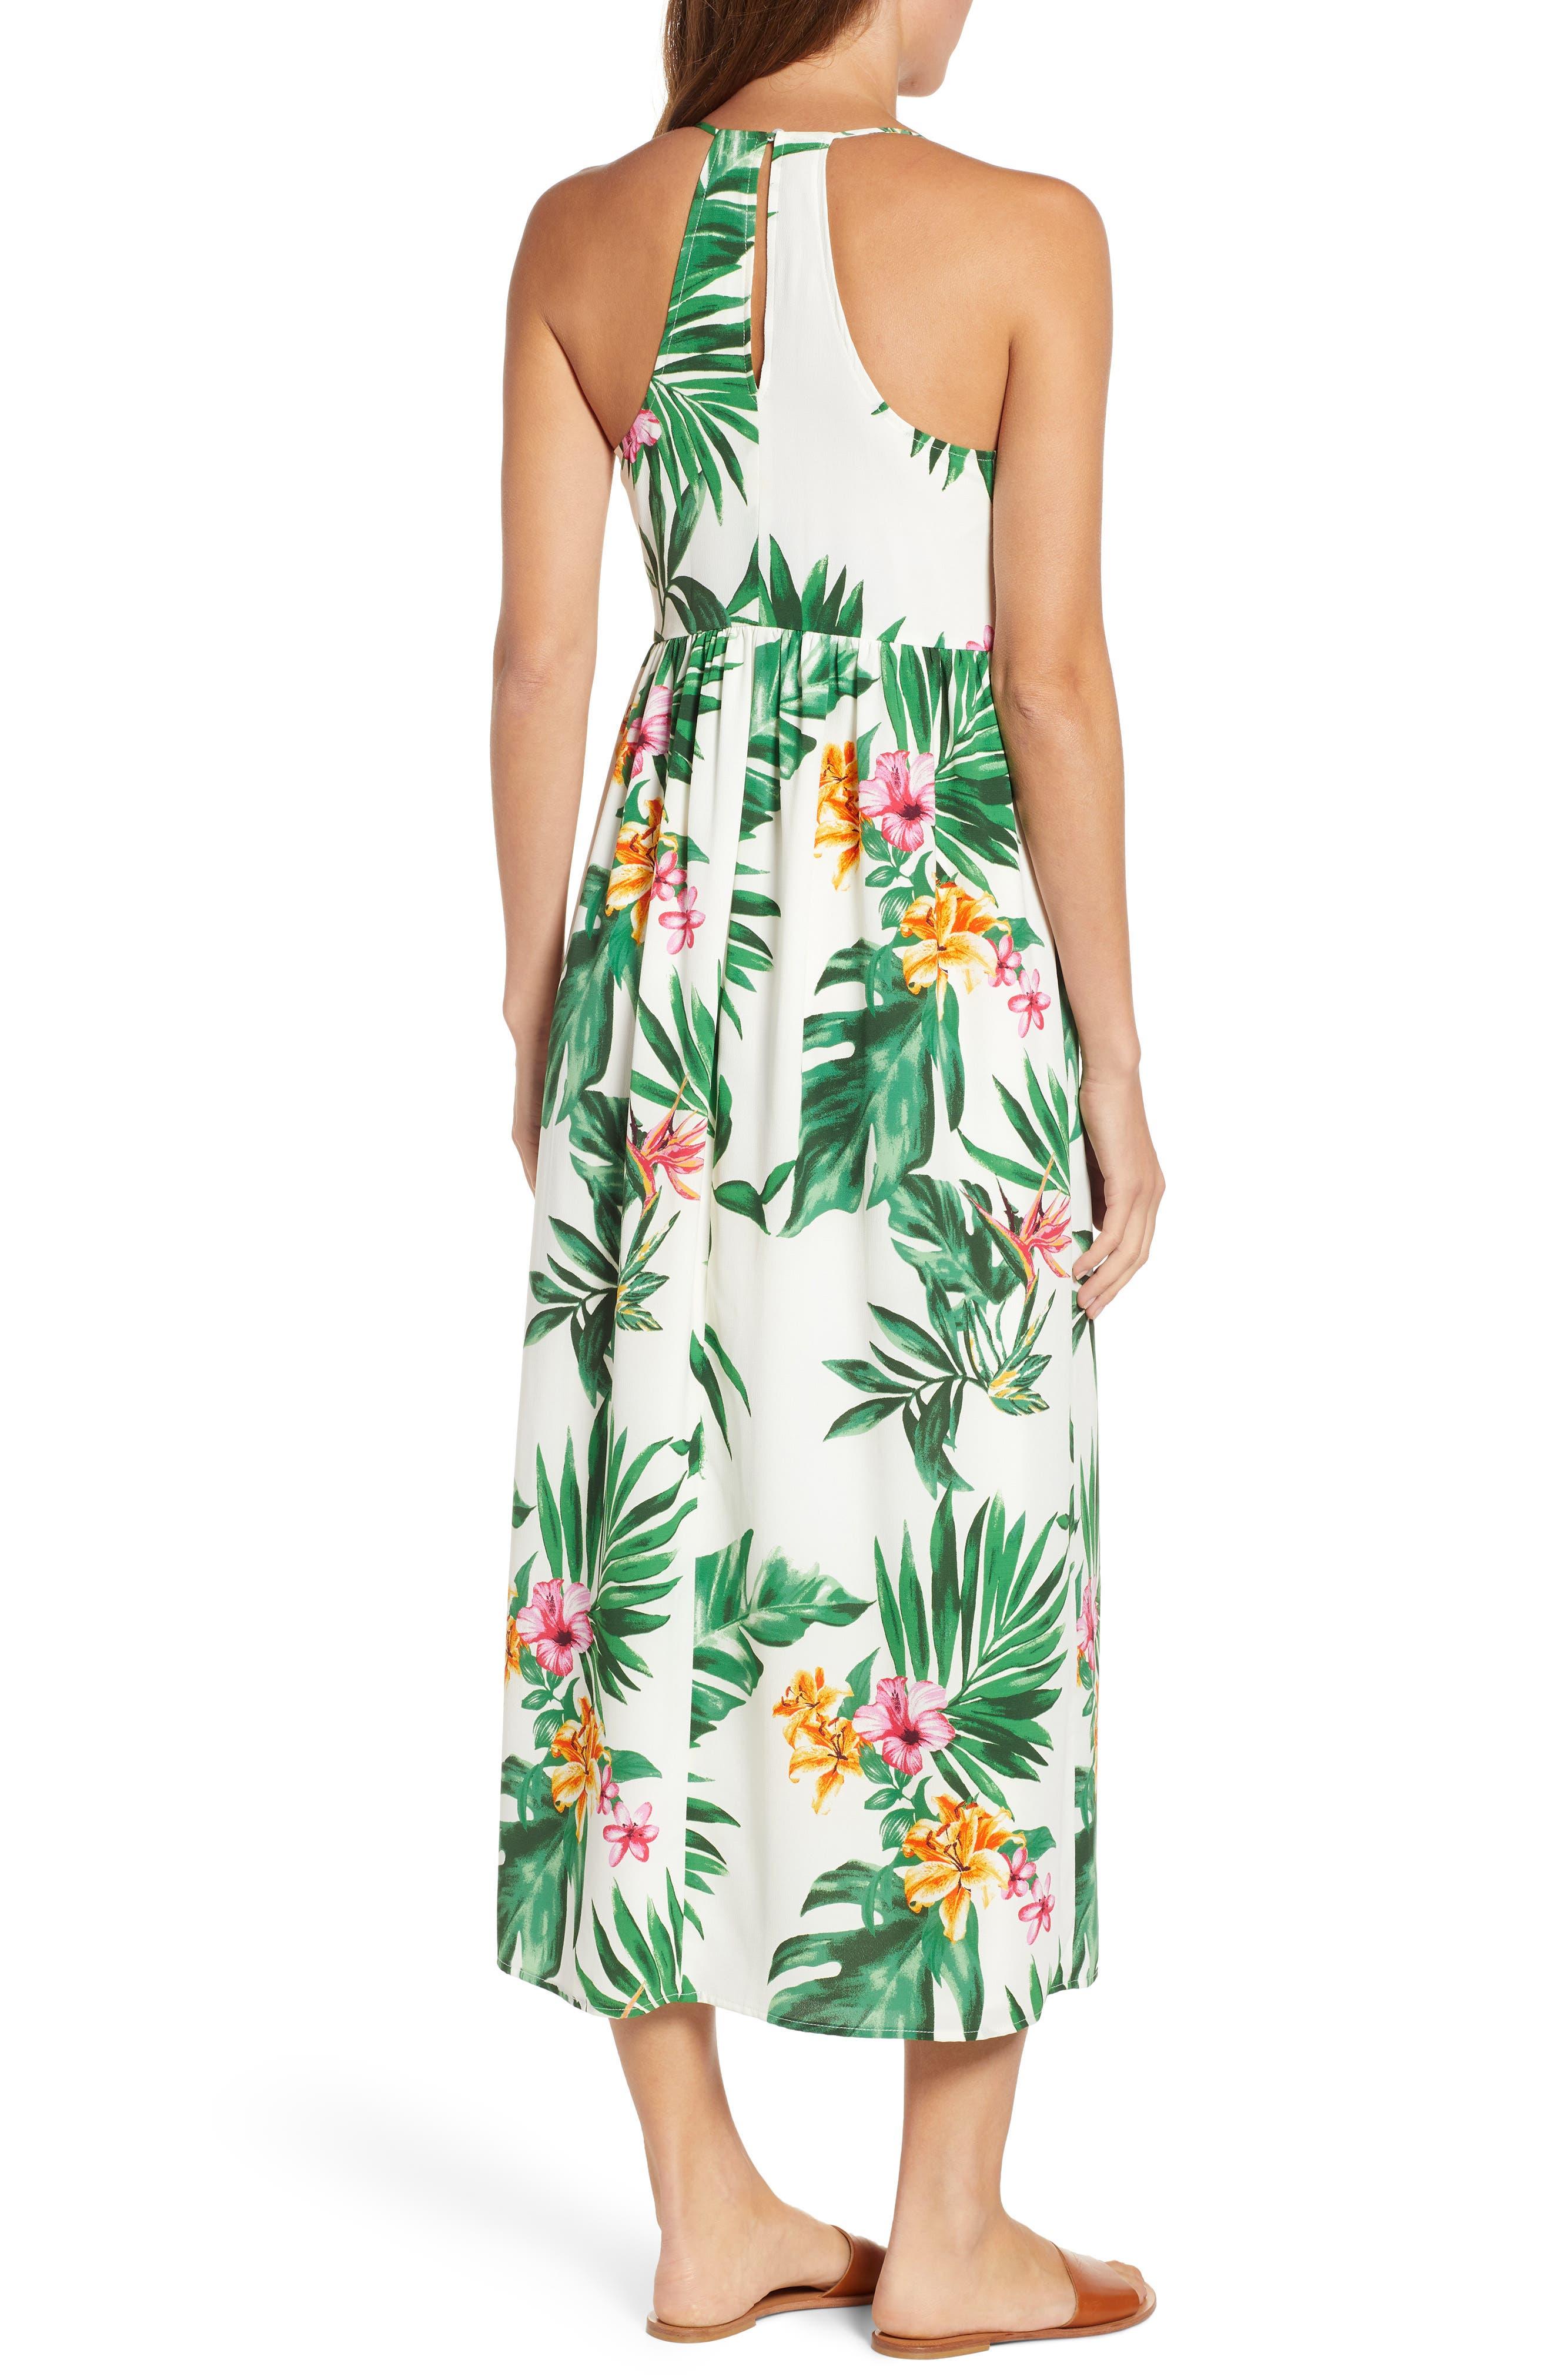 GIBSON, x Hi Sugarplum! Palm Springs Festival Maxi Dress, Alternate thumbnail 2, color, BIRD OF PARADISE